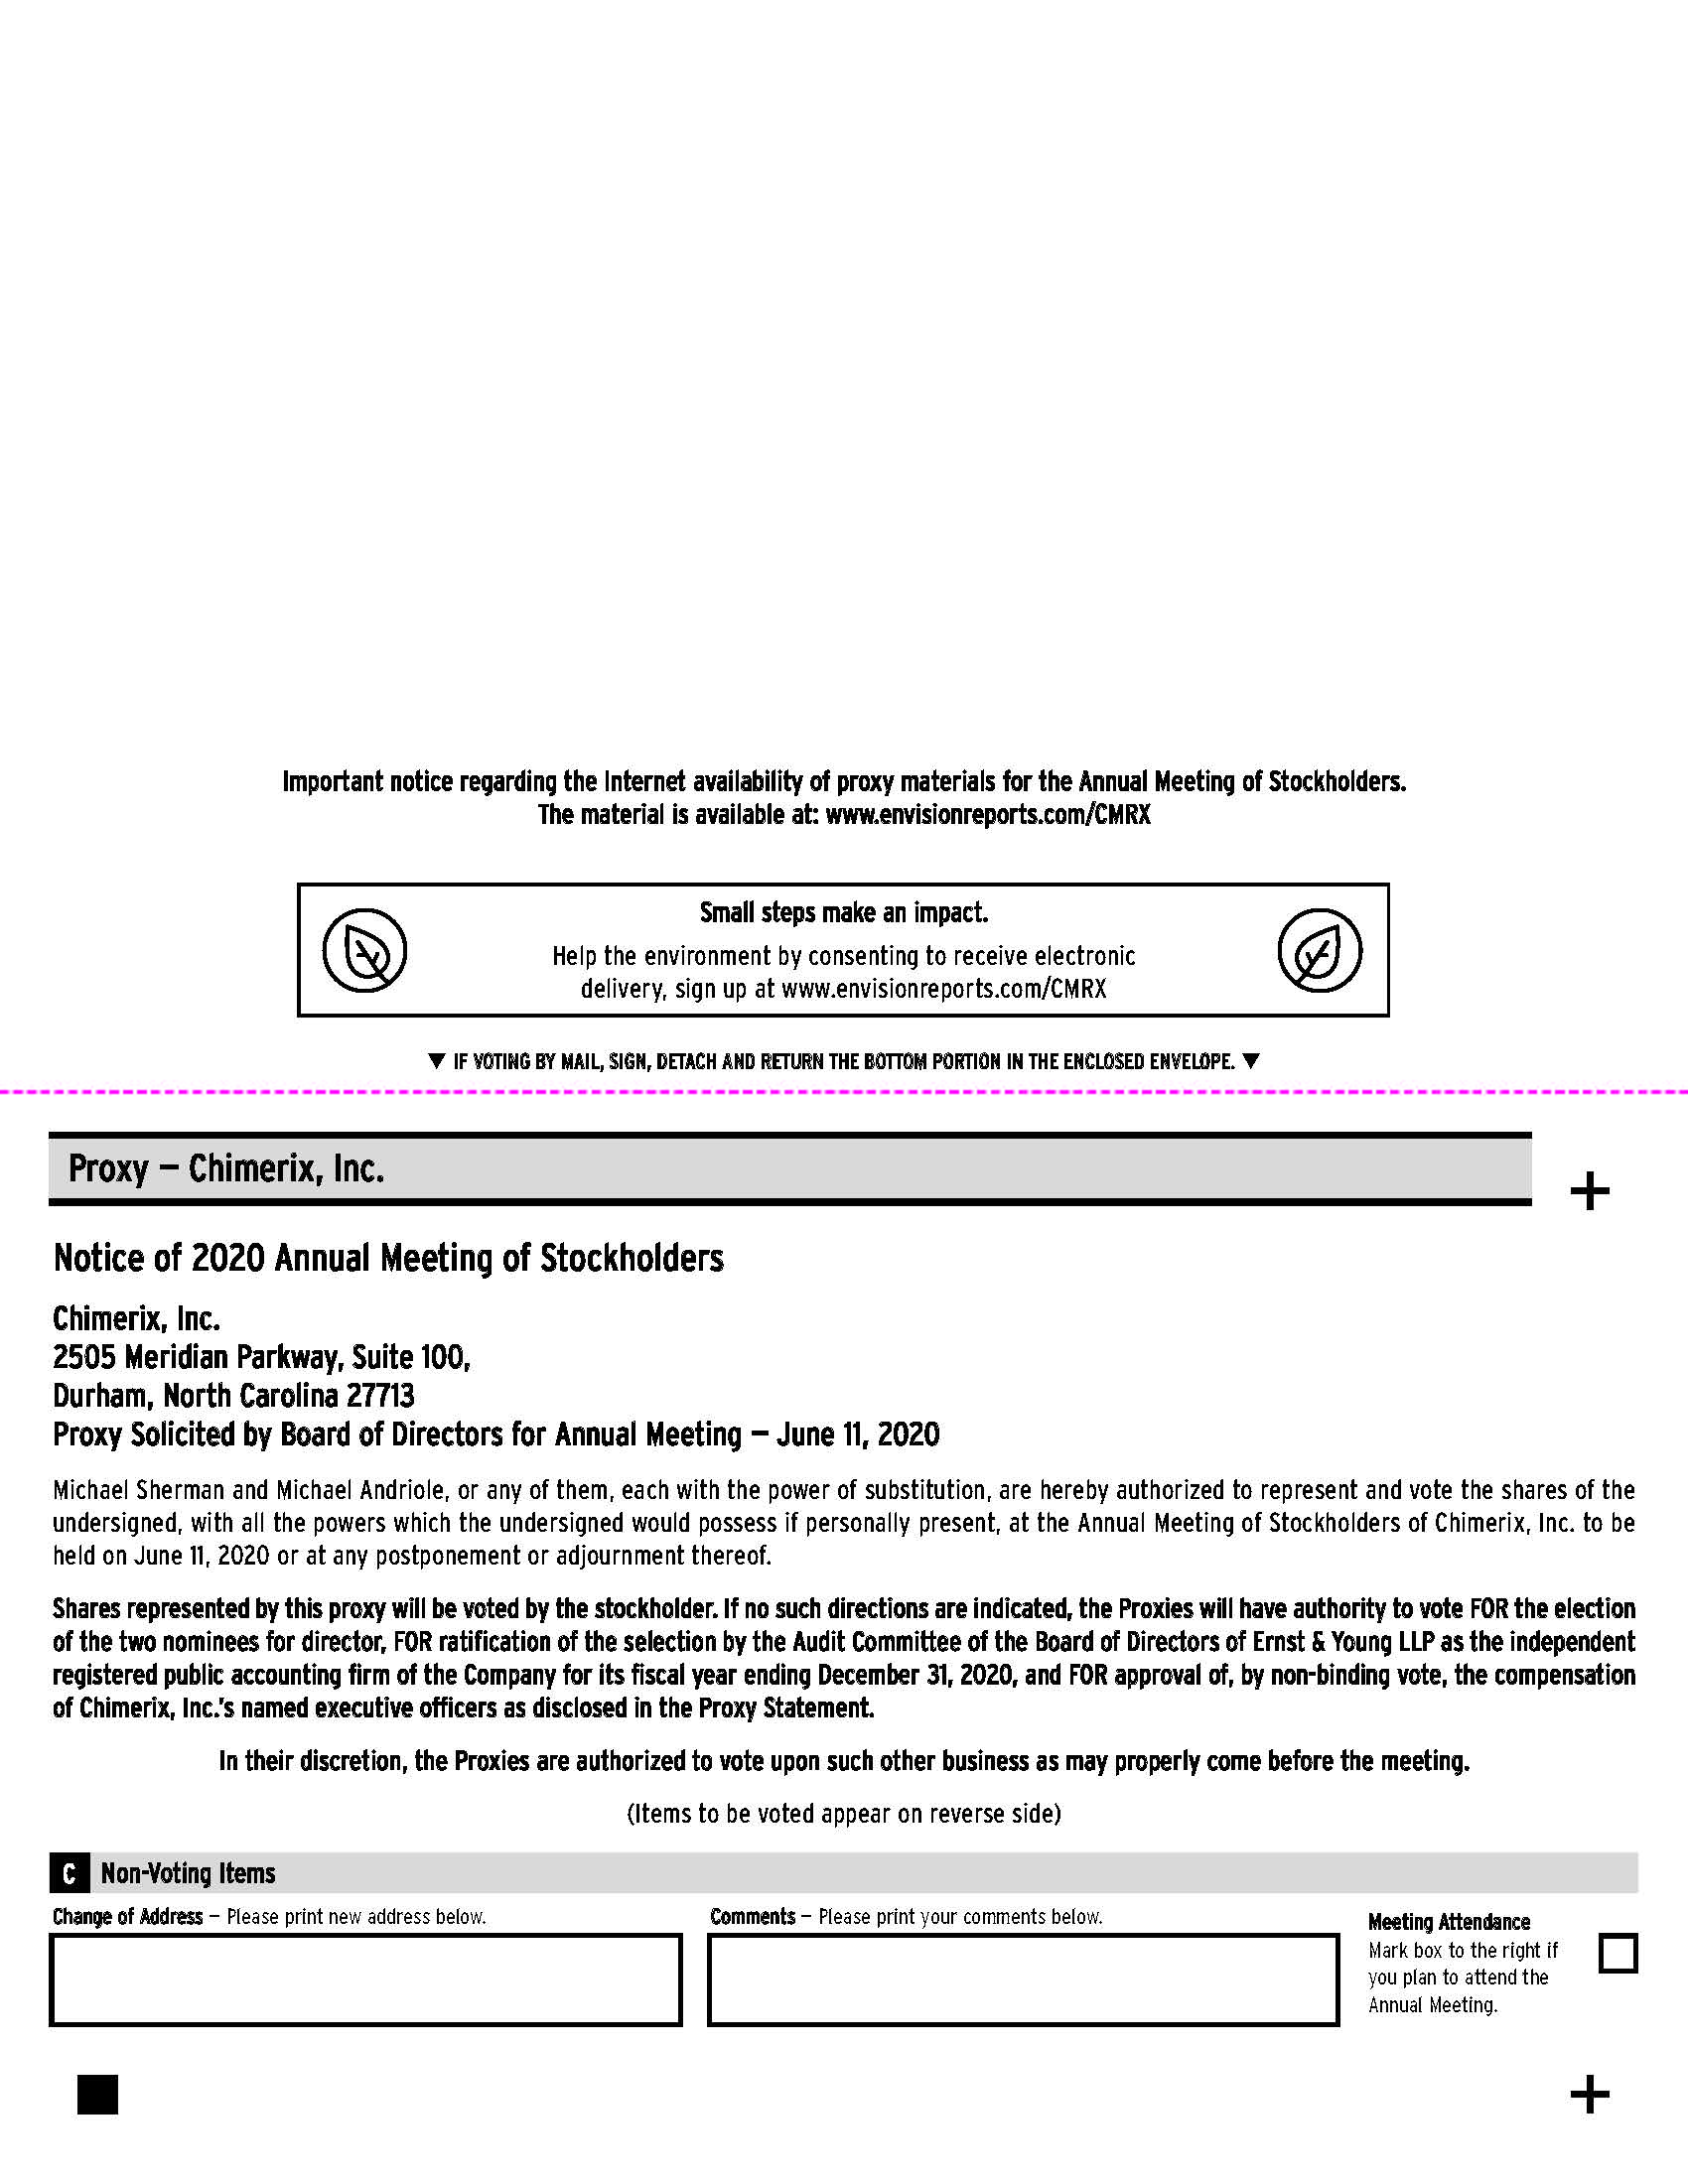 proxycardv3page2.jpg